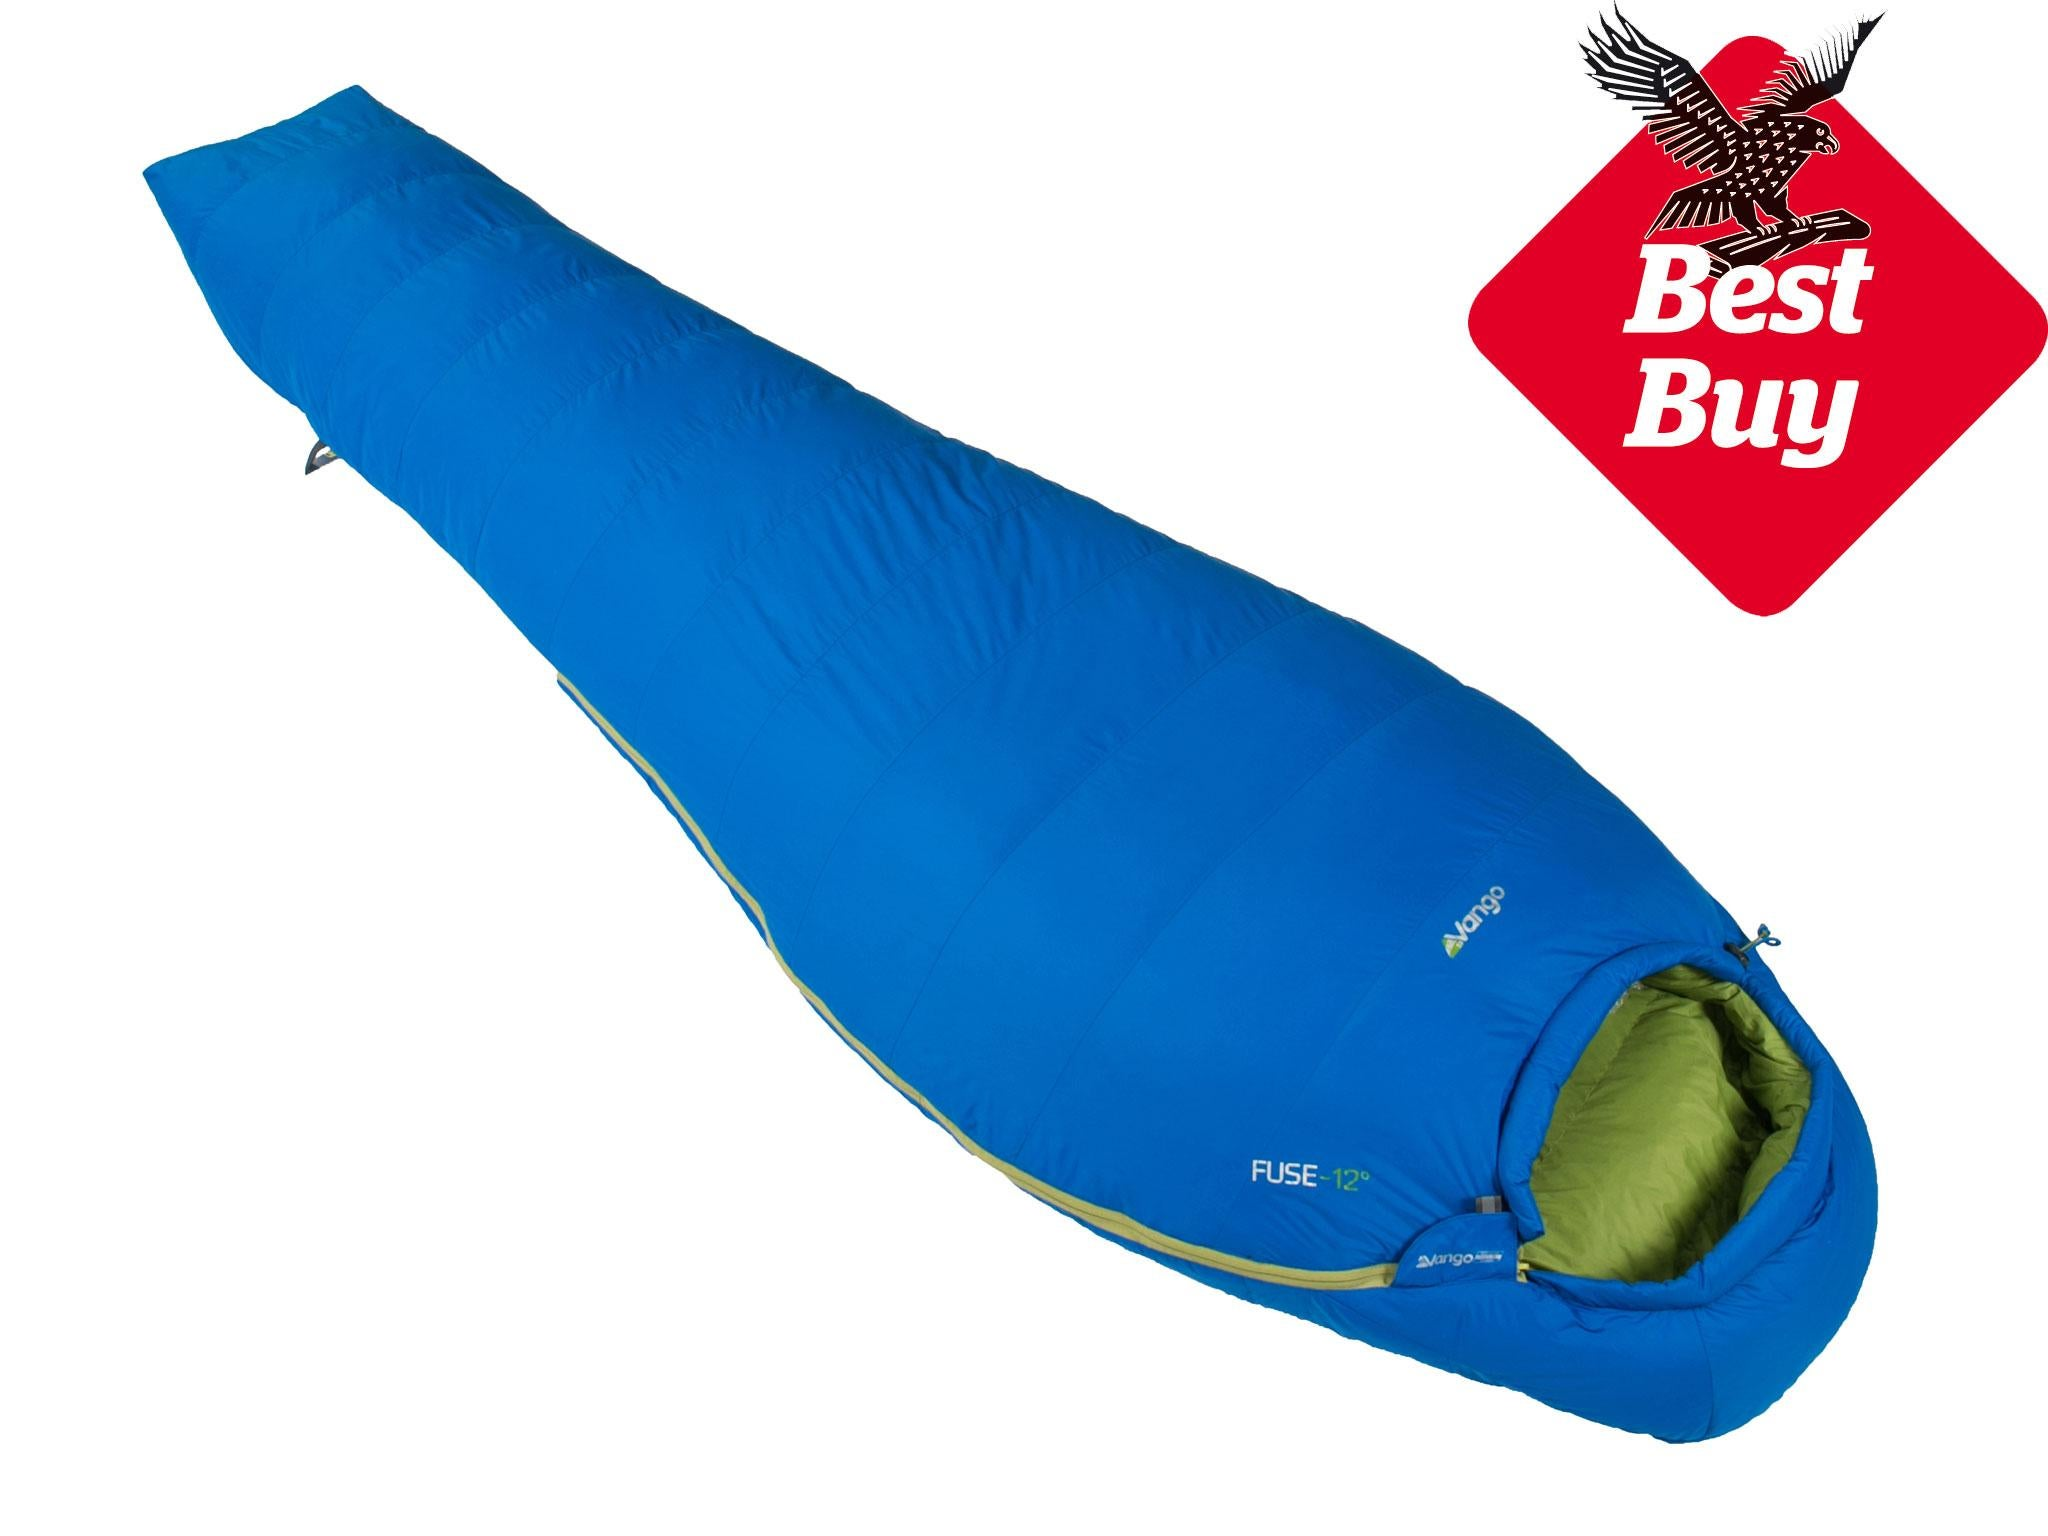 f4725db3c01 10 best sleeping bags